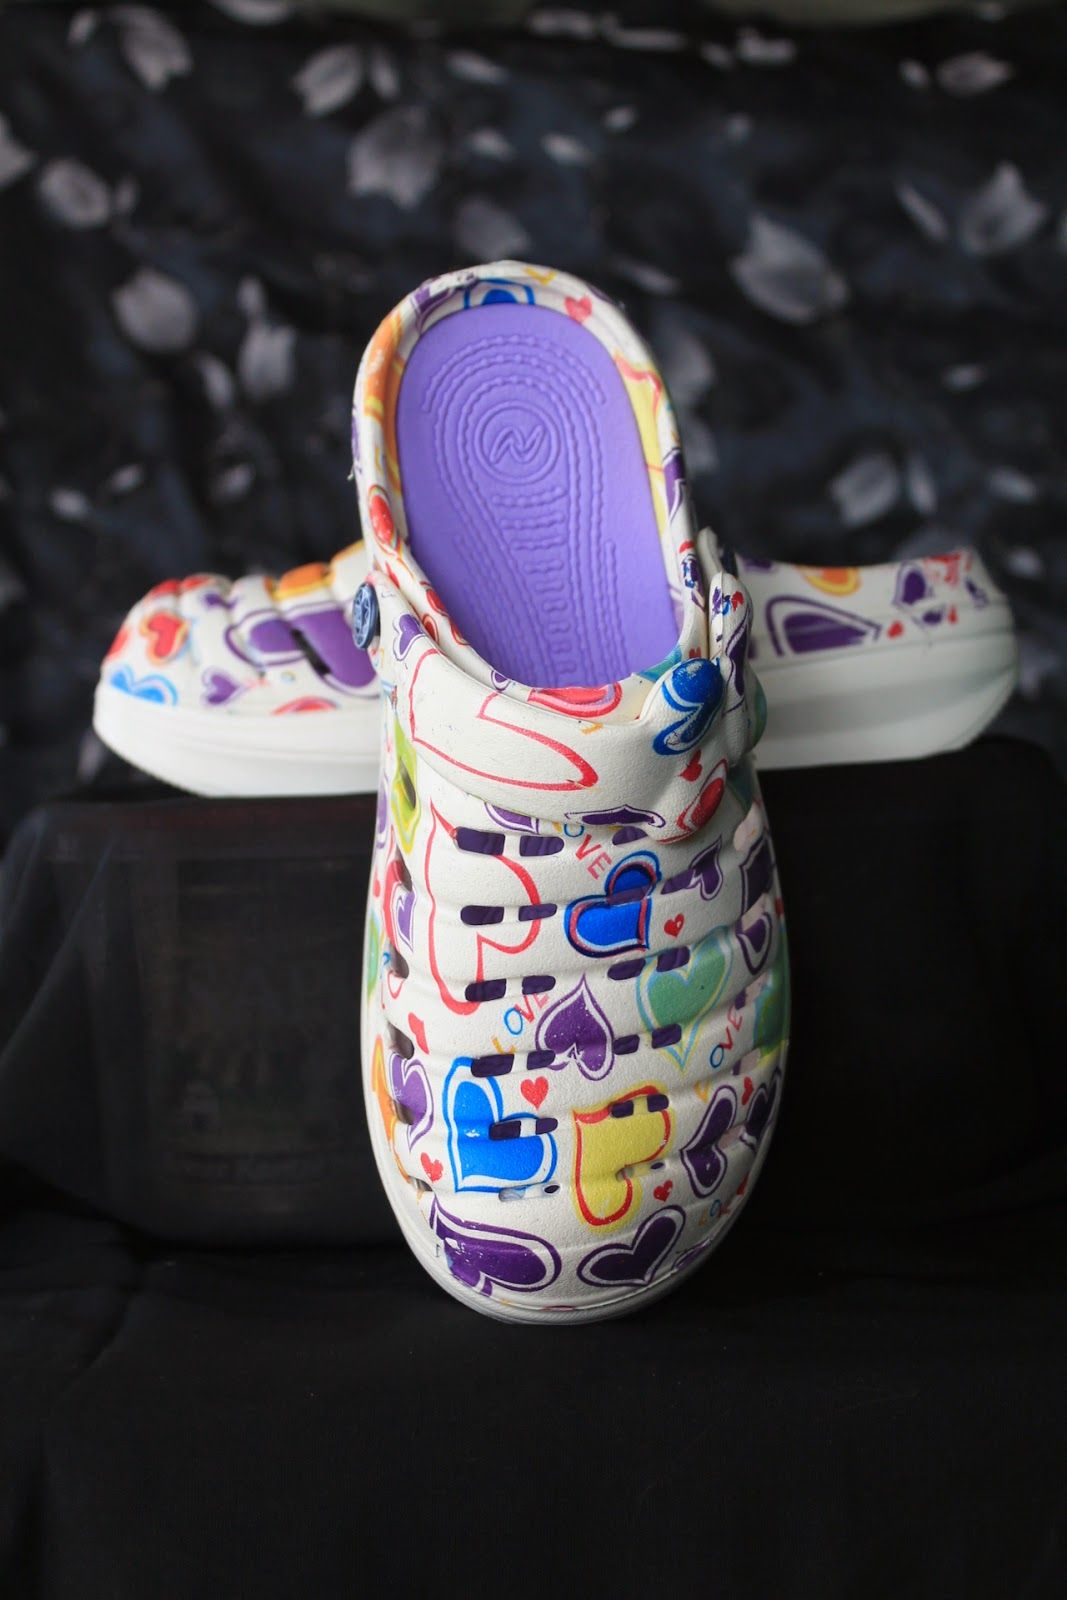 baim korea cewekKode Barang BKC161 Harga Rp 52,000.00 Keterangan sandal  baim korea cewek,new era